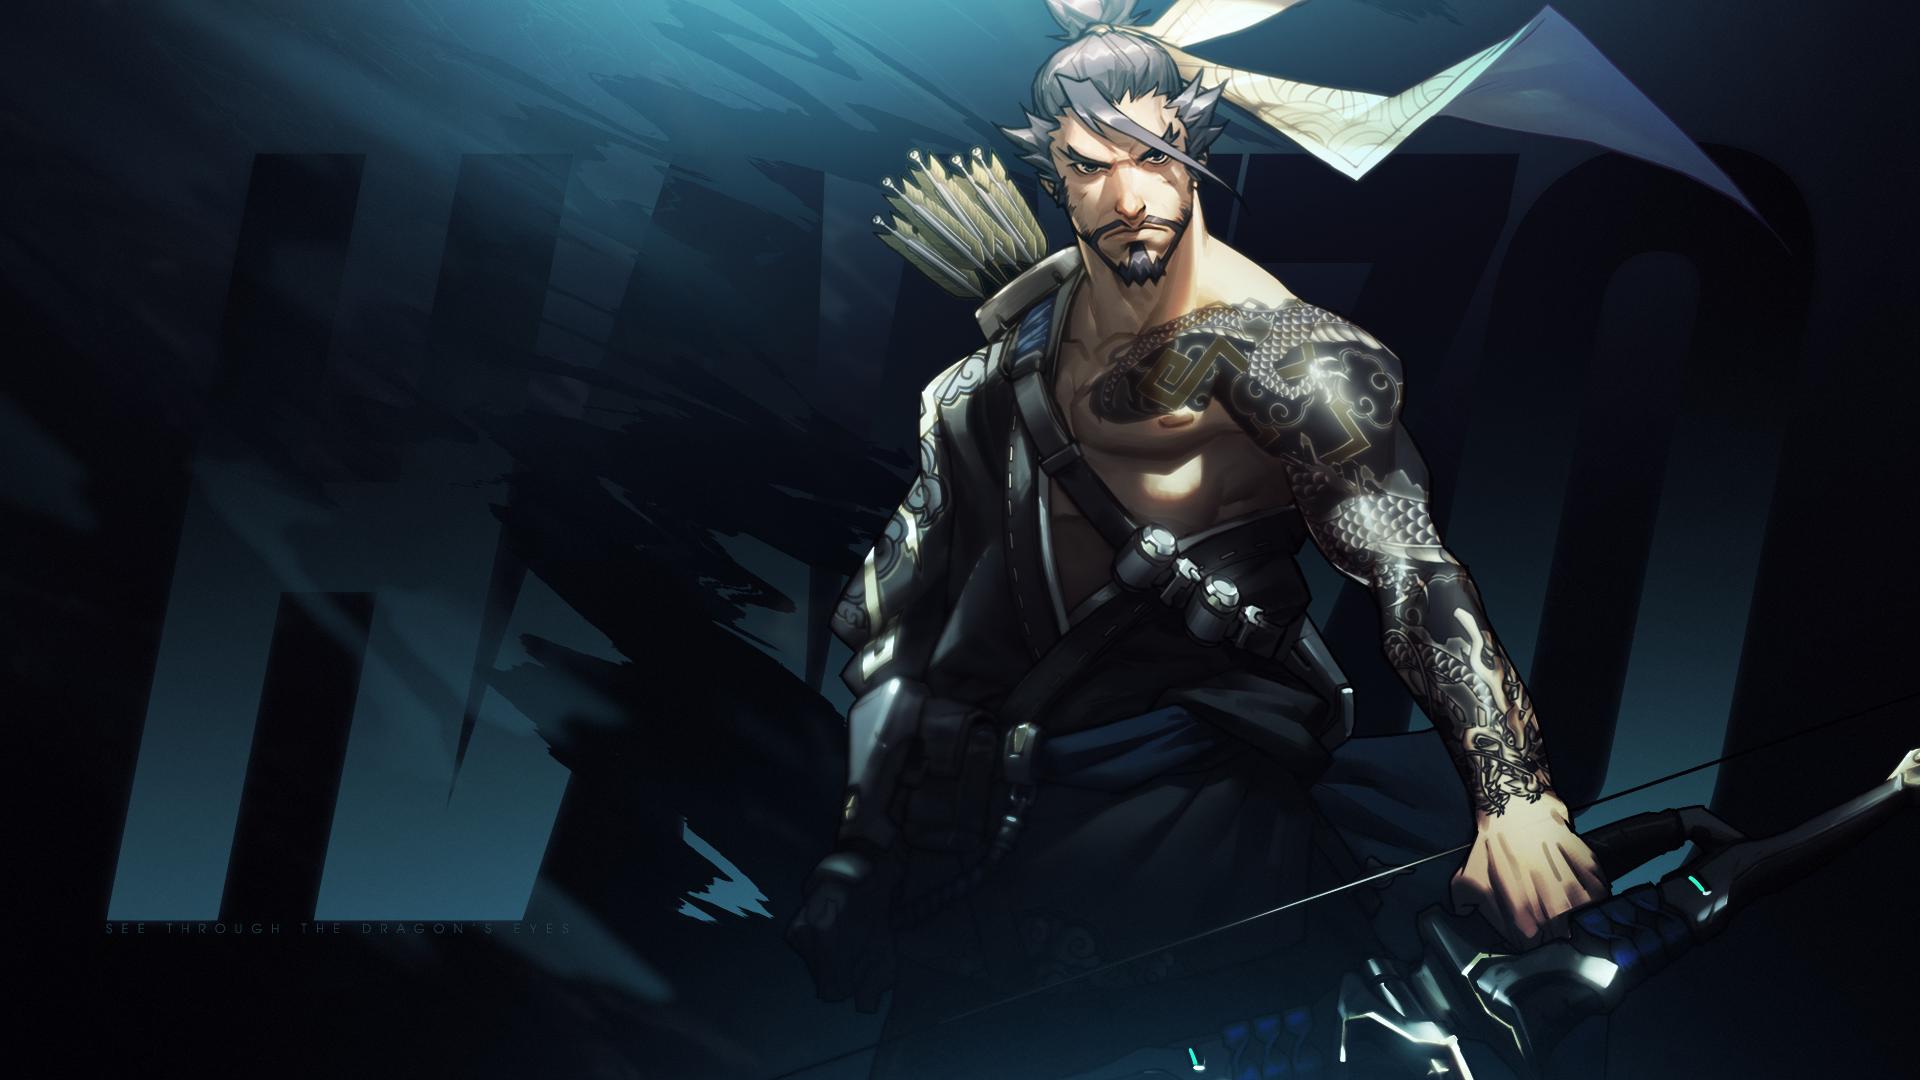 video game overwatch hanzo wallpaper | video game | pinterest